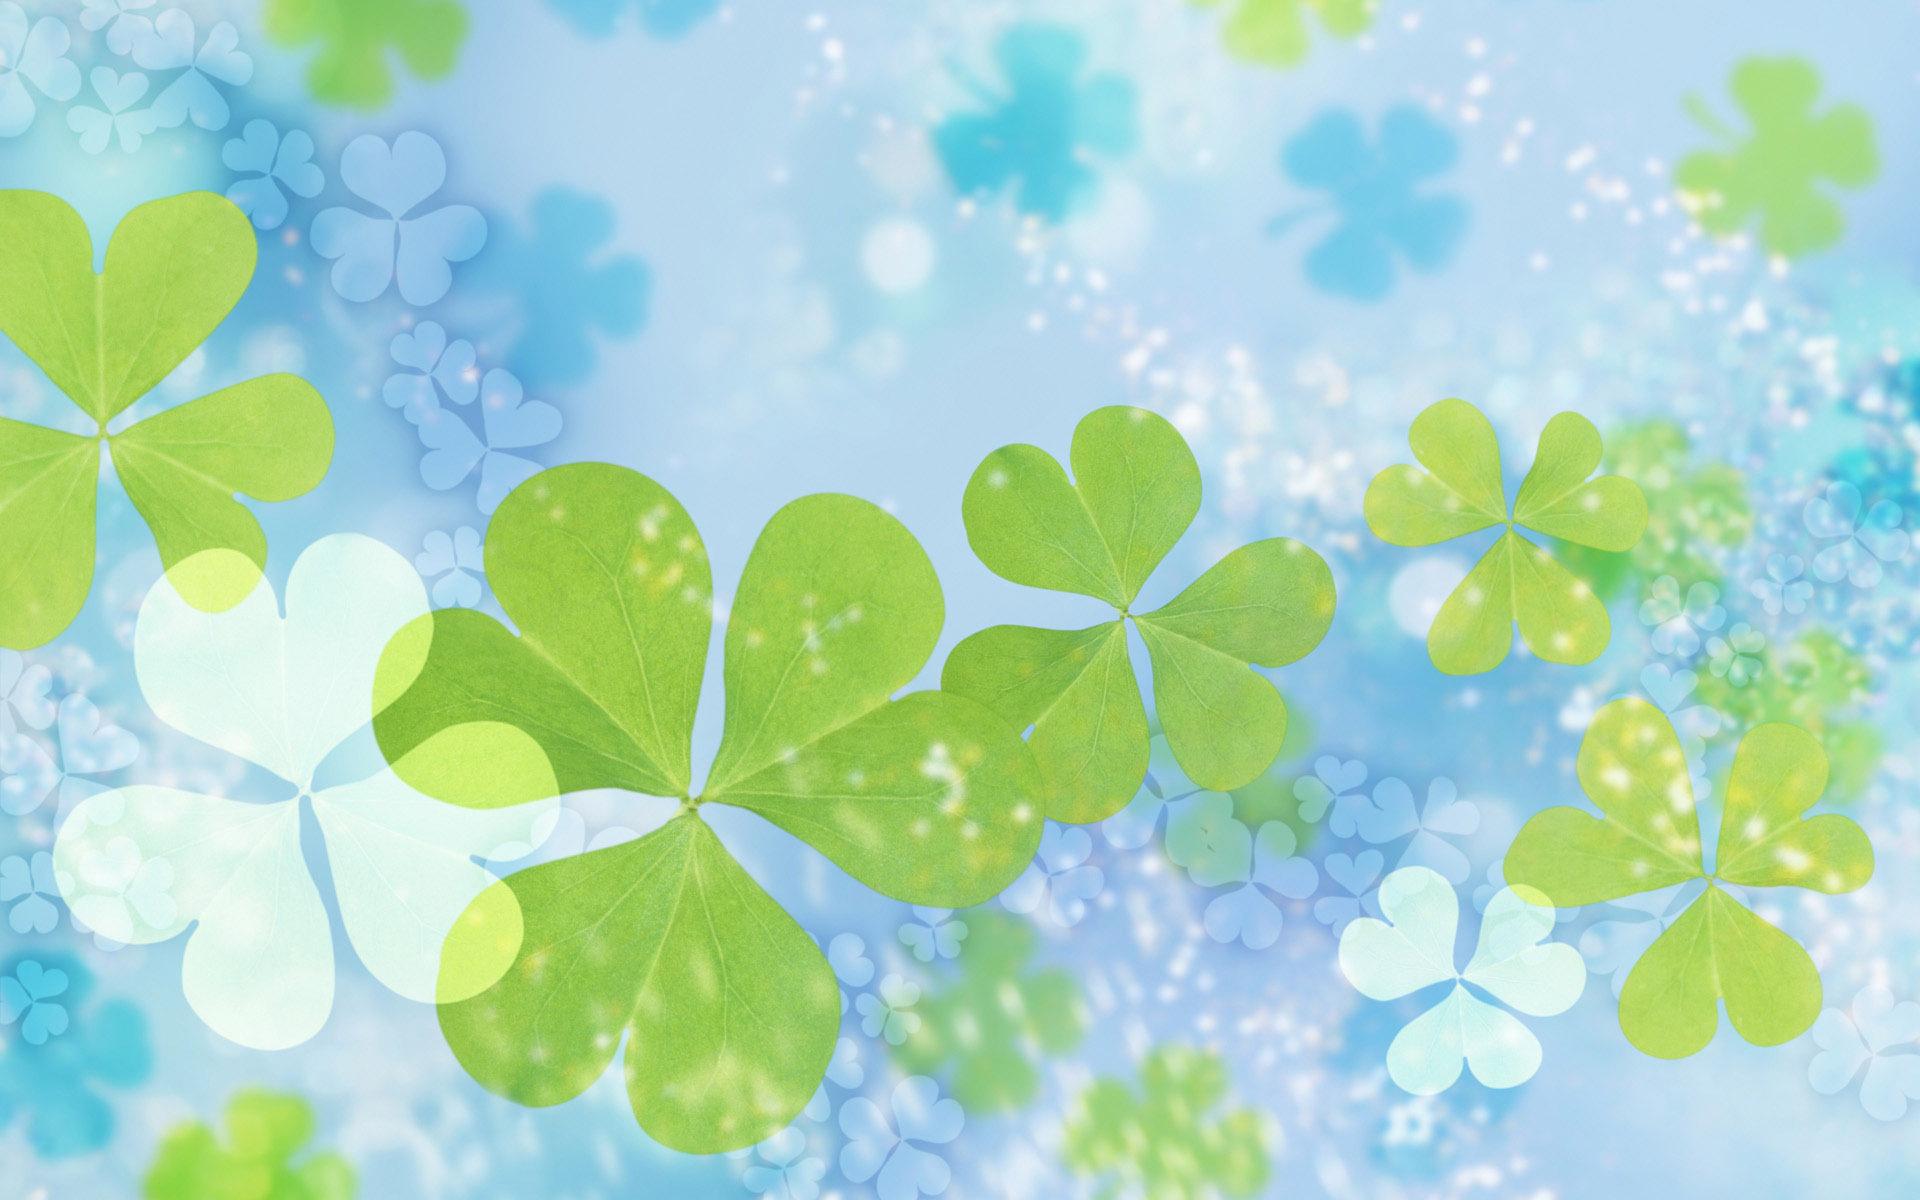 Hd Wallpaper Saint Patricks Day Top HD Wallpapers   ImgHD Browse 1920x1200